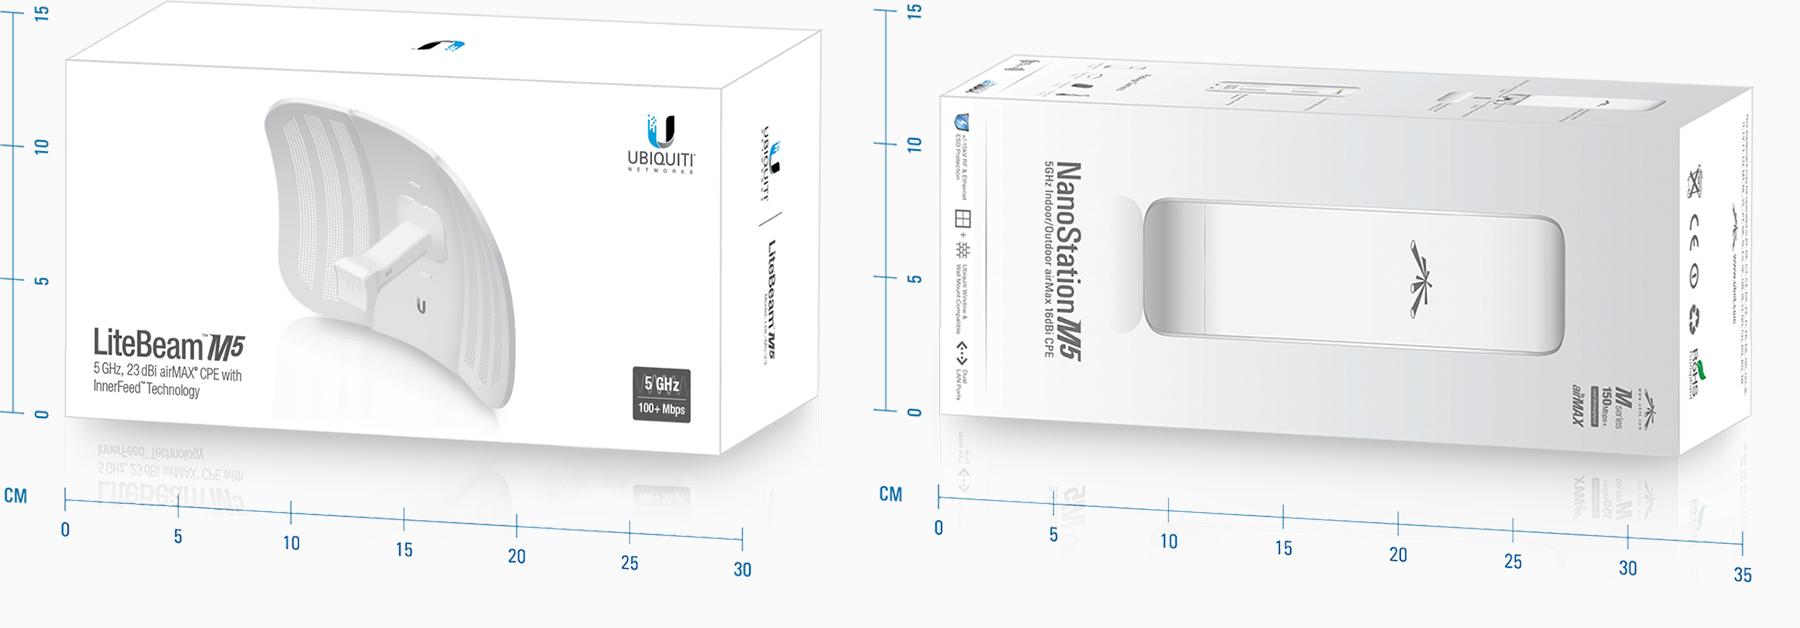 Litebeam 5 GHz 23 dBi Accesorio de Red Ubiquiti LBE-M5-23